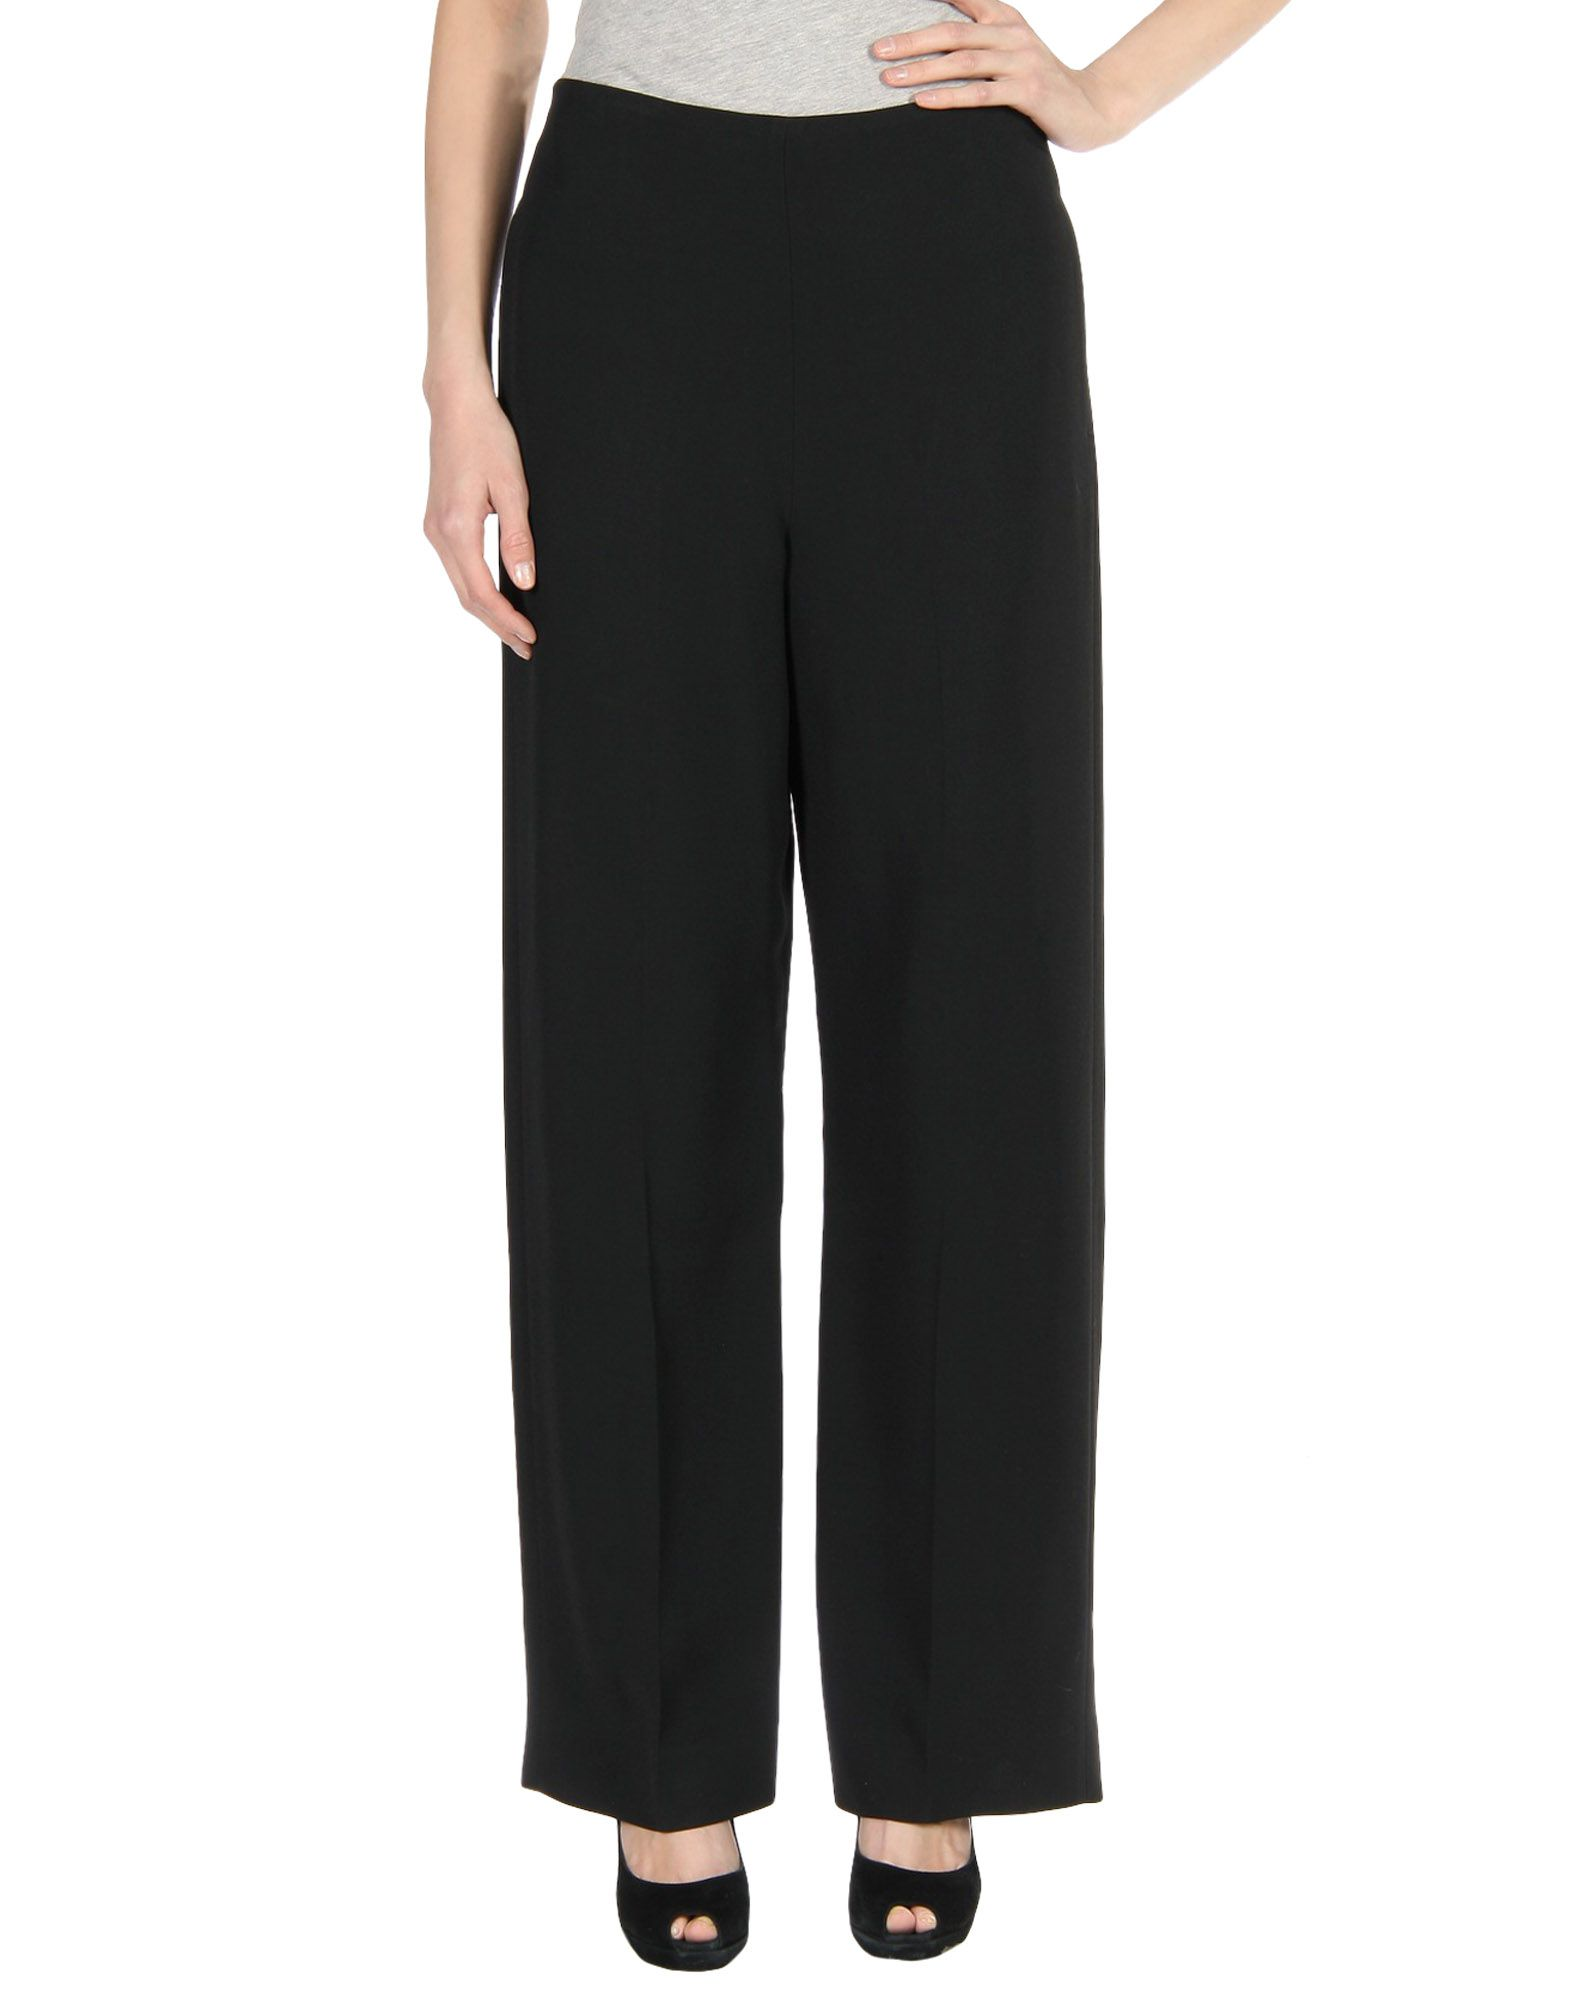 Pantalone Haider Ackermann Donna - Acquista online su IcwWGQ7vt